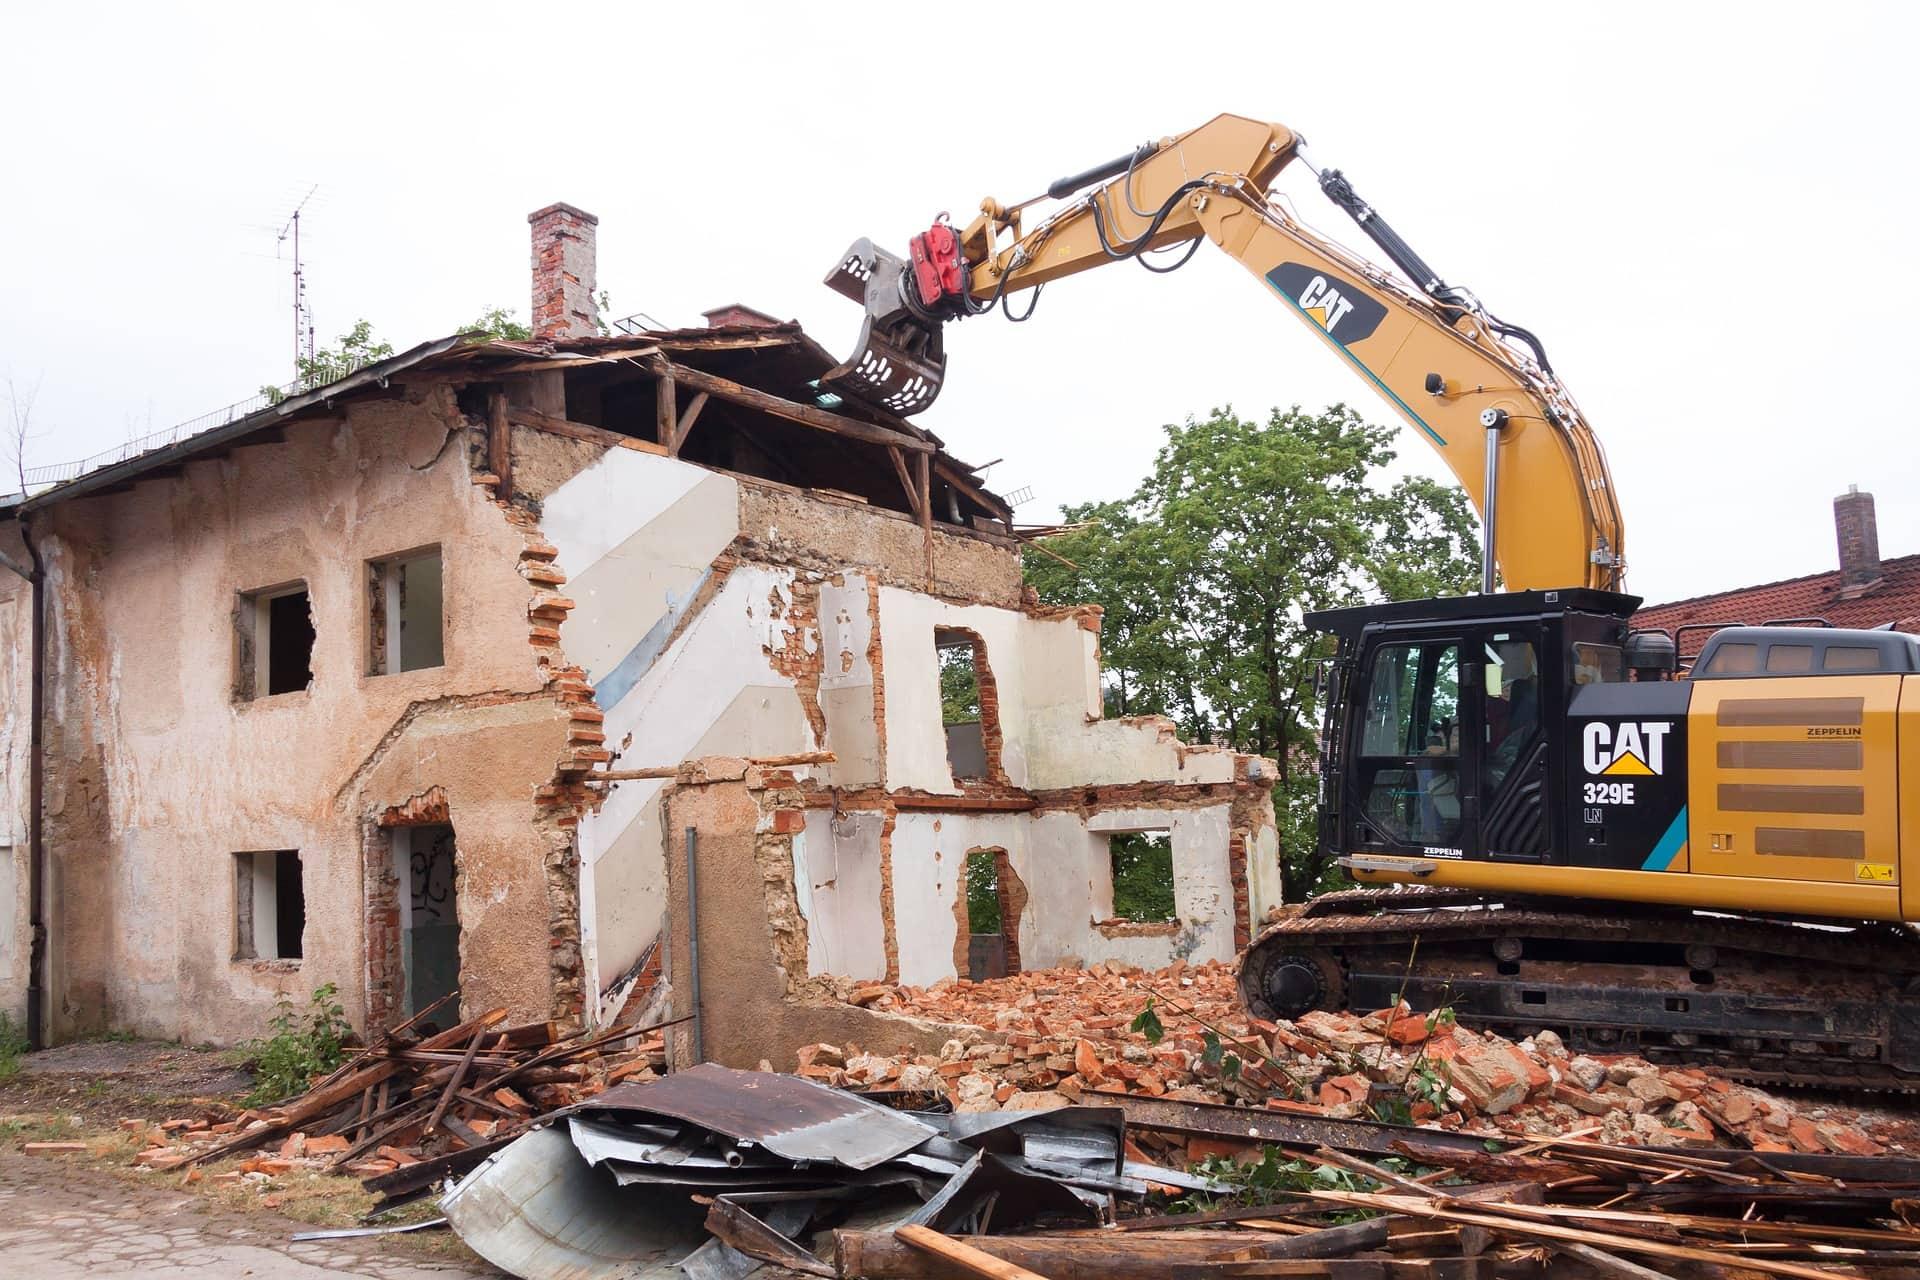 A house demolition